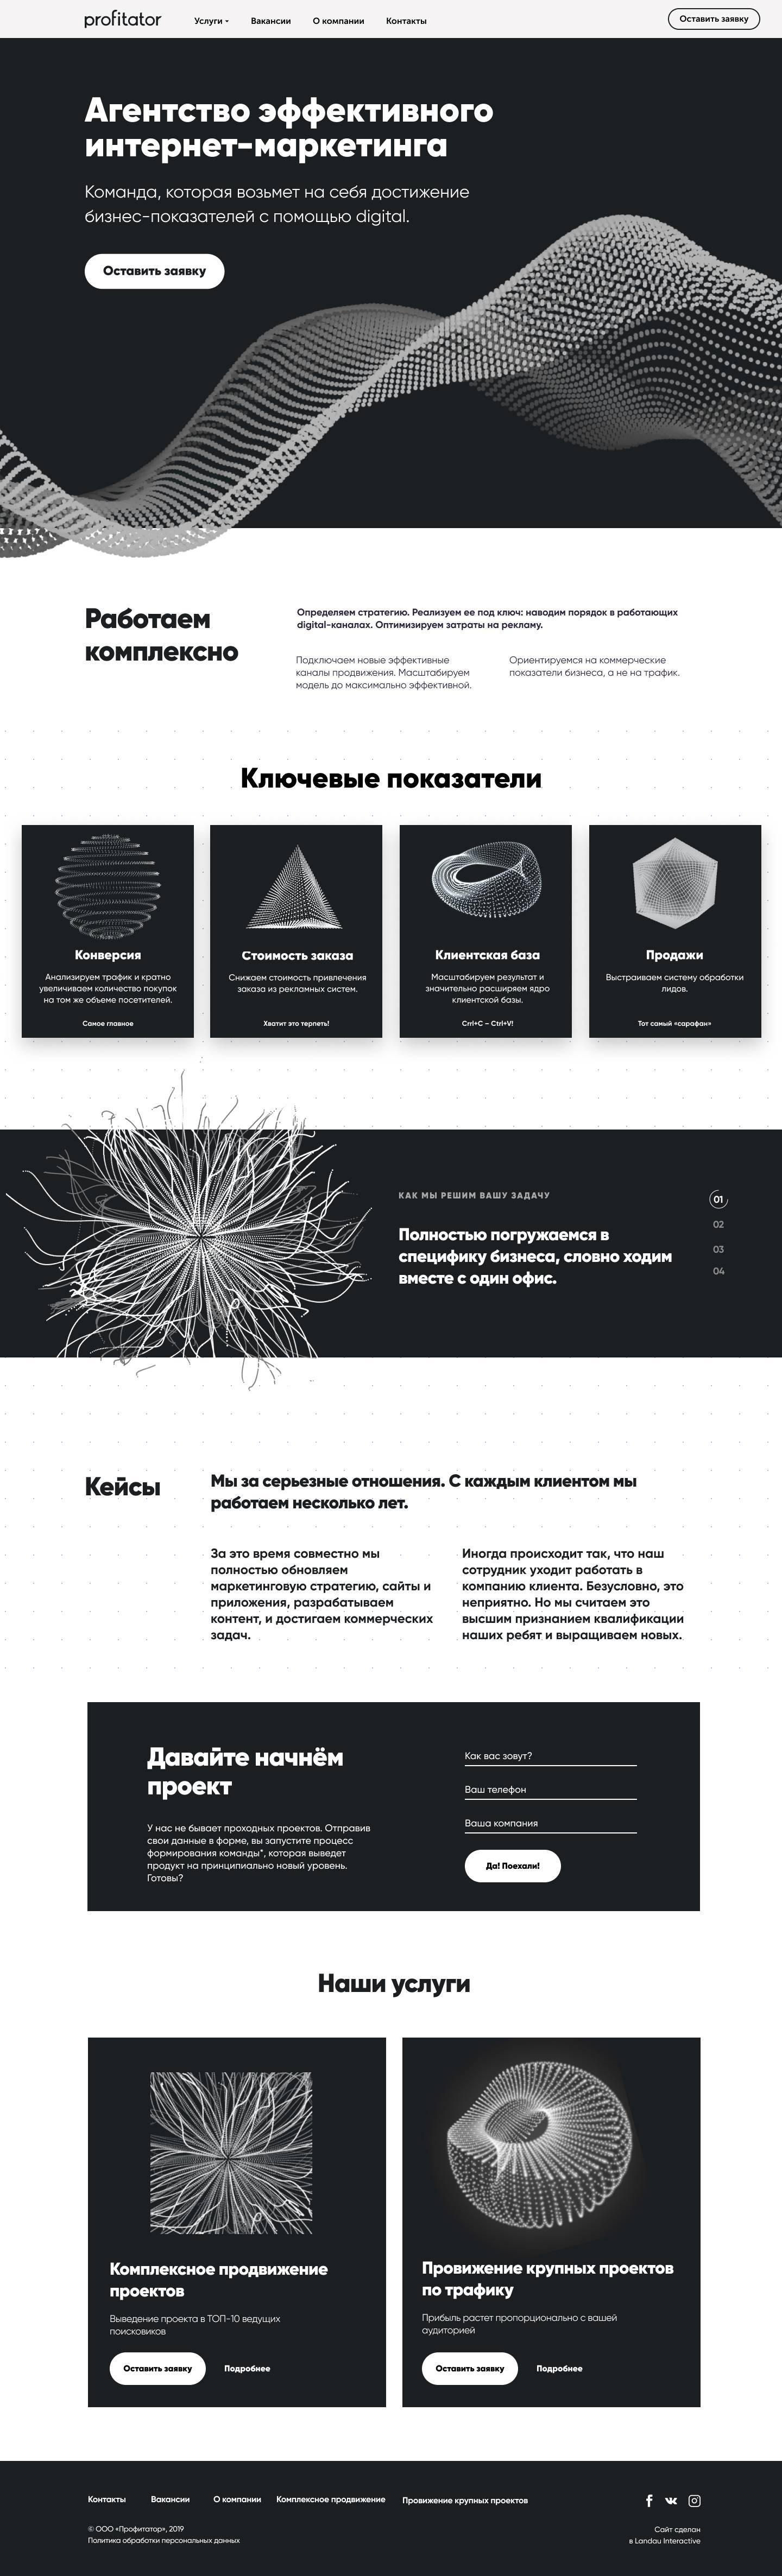 Professional website design - Profitator